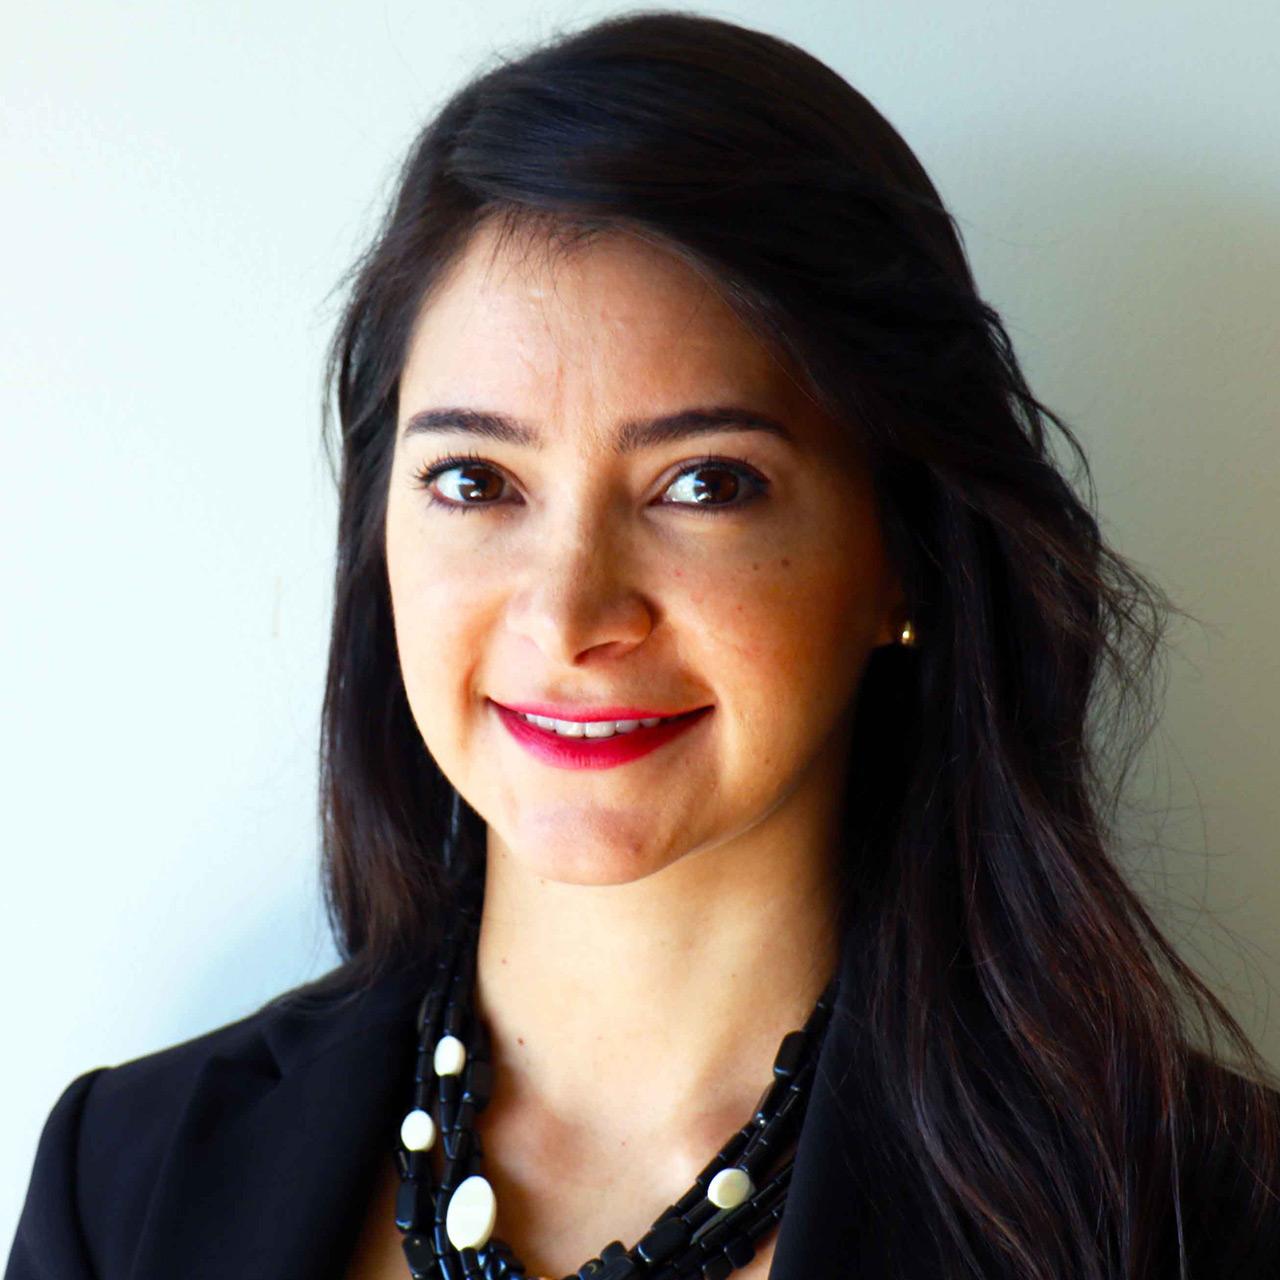 Bibiana Velasquez